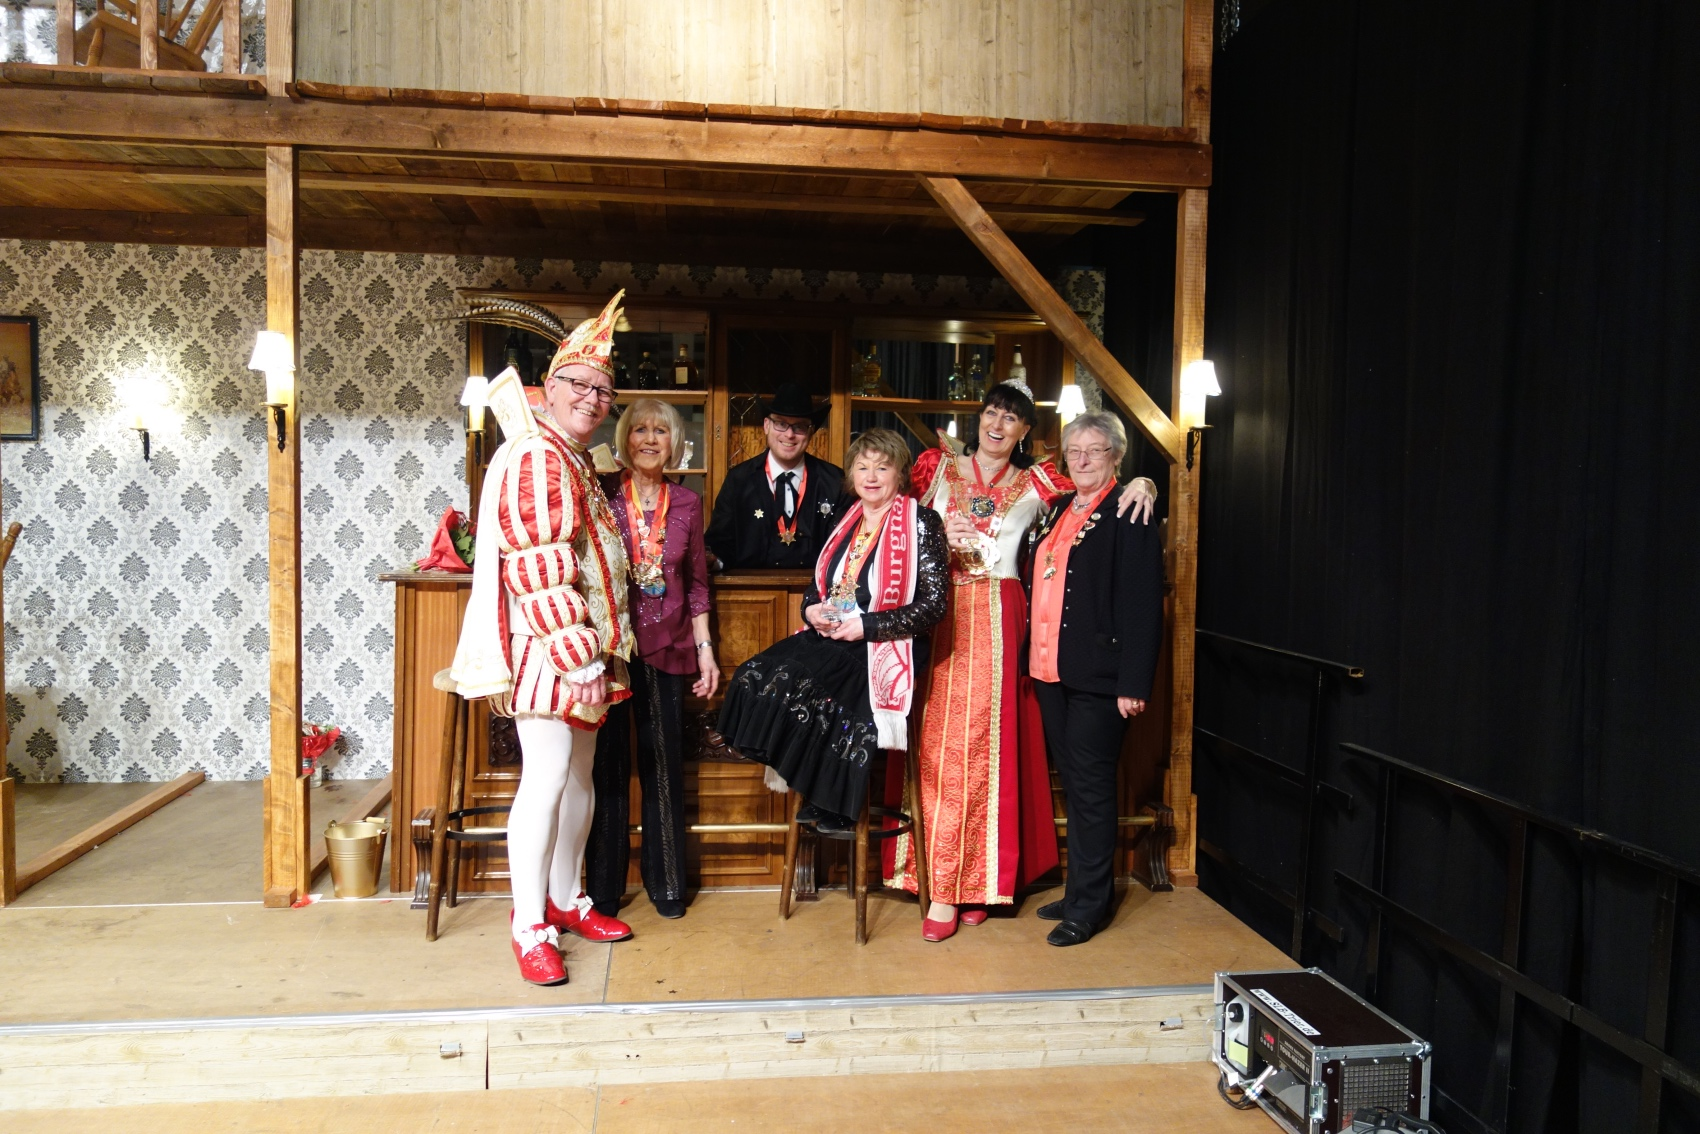 2019-02-24 057RH TR-Irsch Ordensfest Prinzenpaar im Saloon.jpg